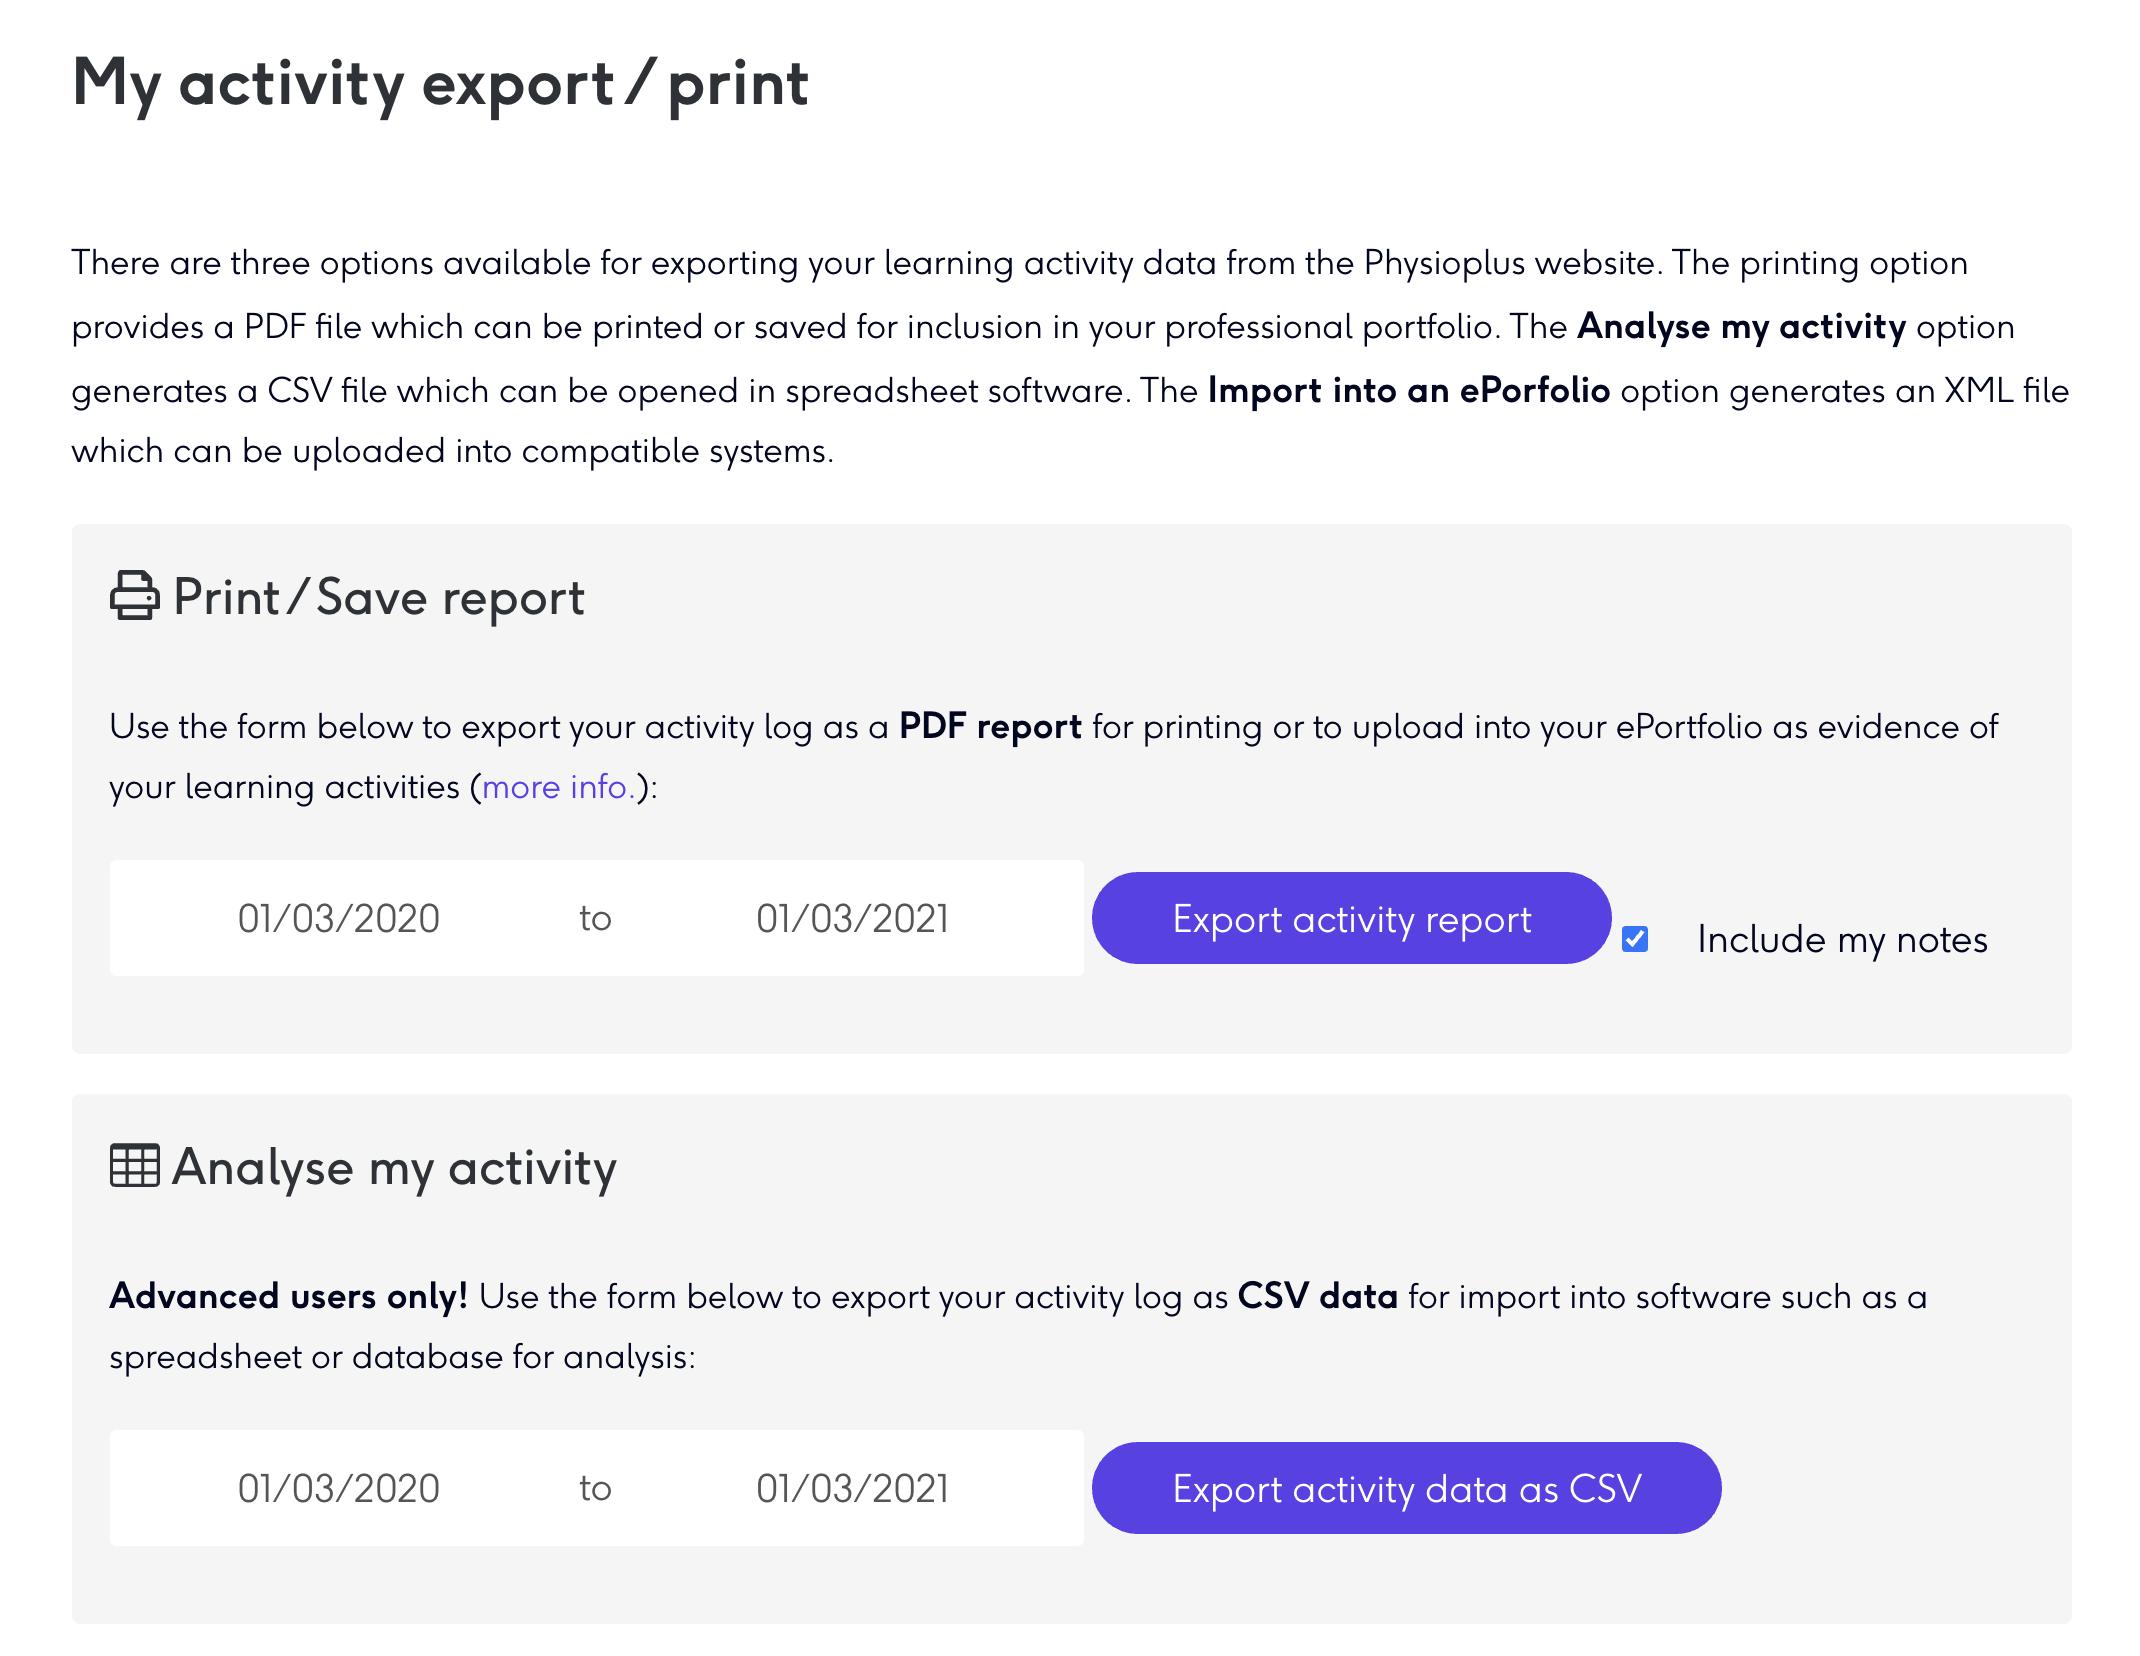 export your activity log